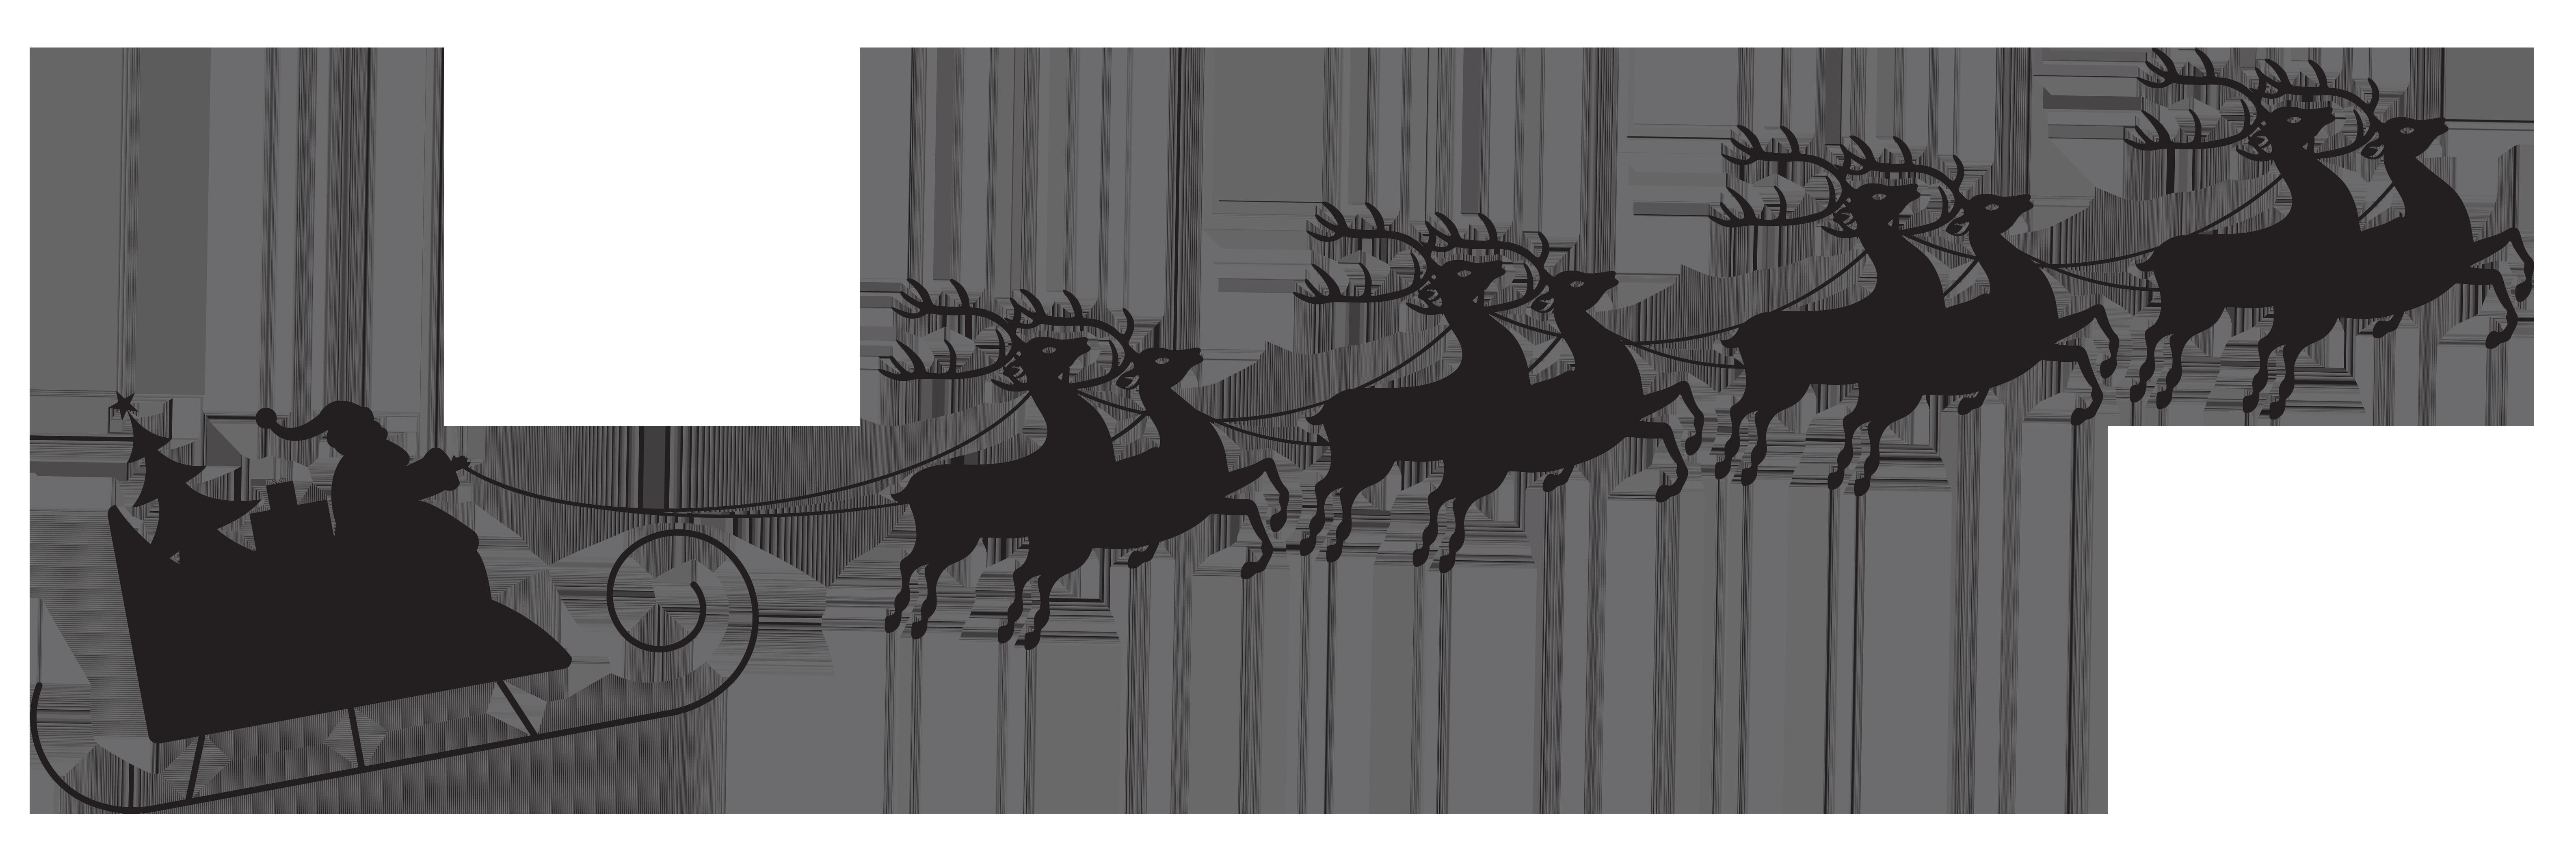 Reindeer Santa Claus Silhouette Sled Clip art.